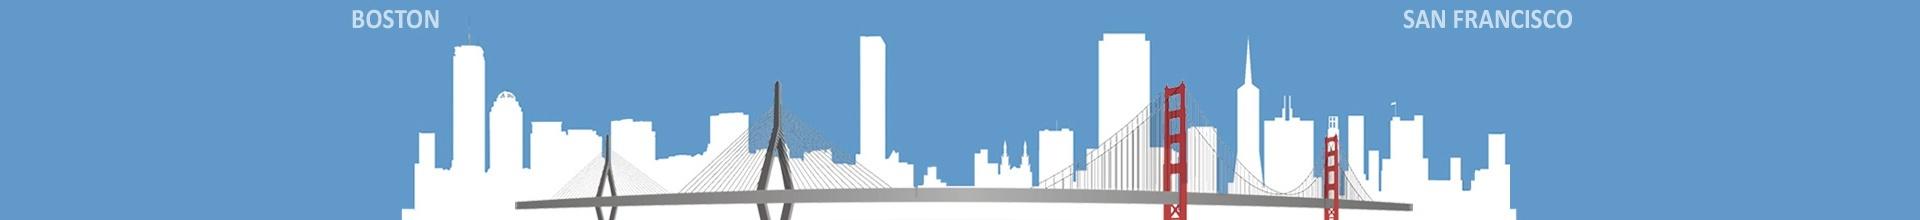 Inside Sales Consultants | Boston | San Francisco